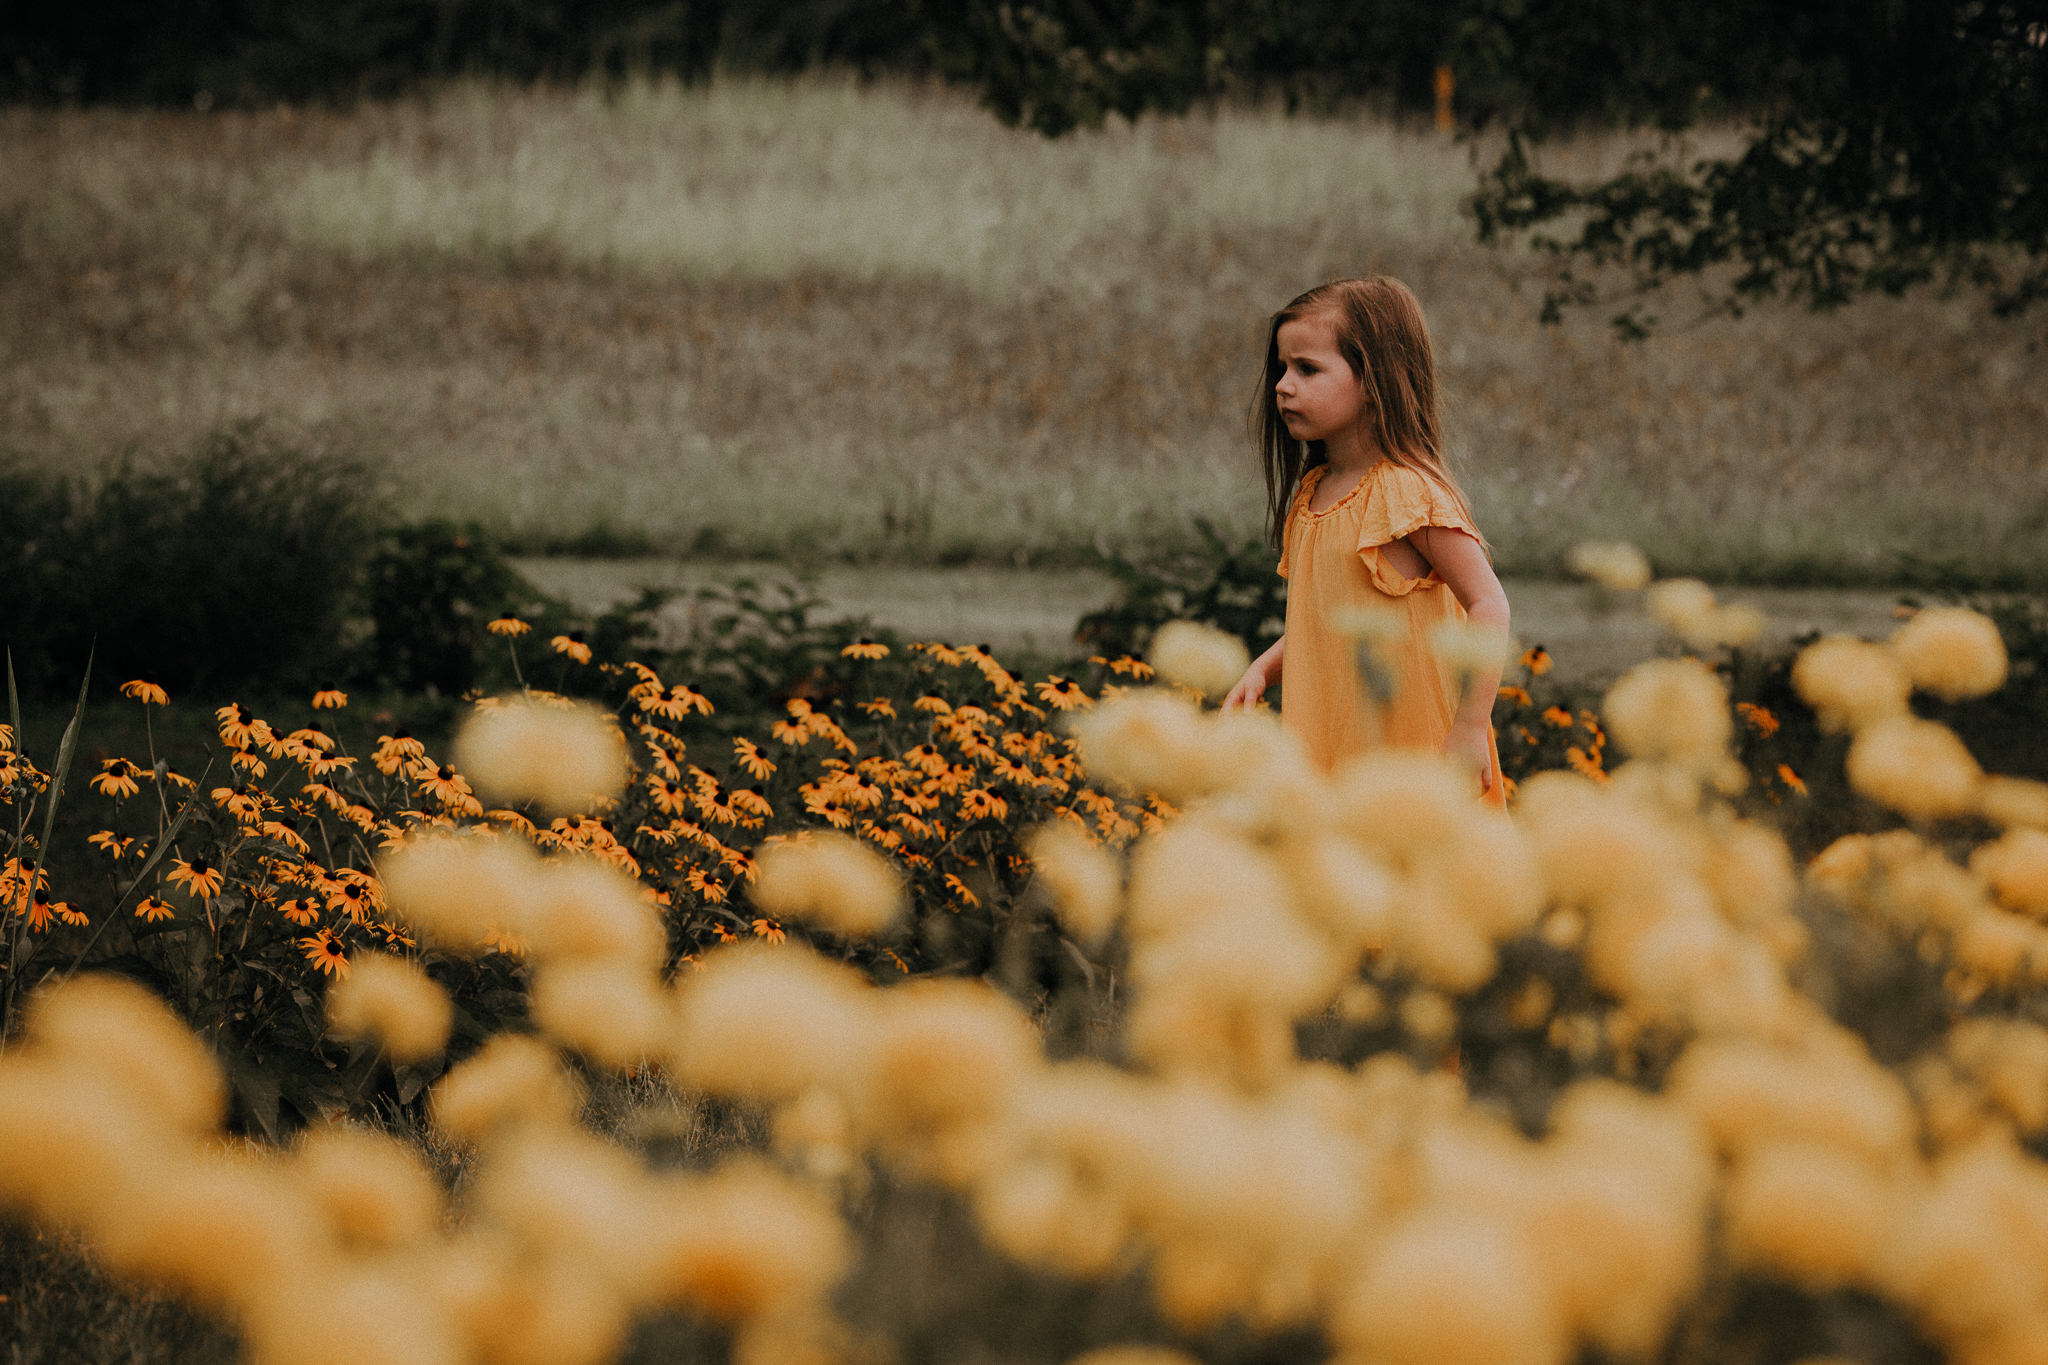 girl in yellow dress walking through field of yellow flowers summer Ashburn Loudoun Northern Virginia family lifestyle documentary childhood Marti Austin Photography